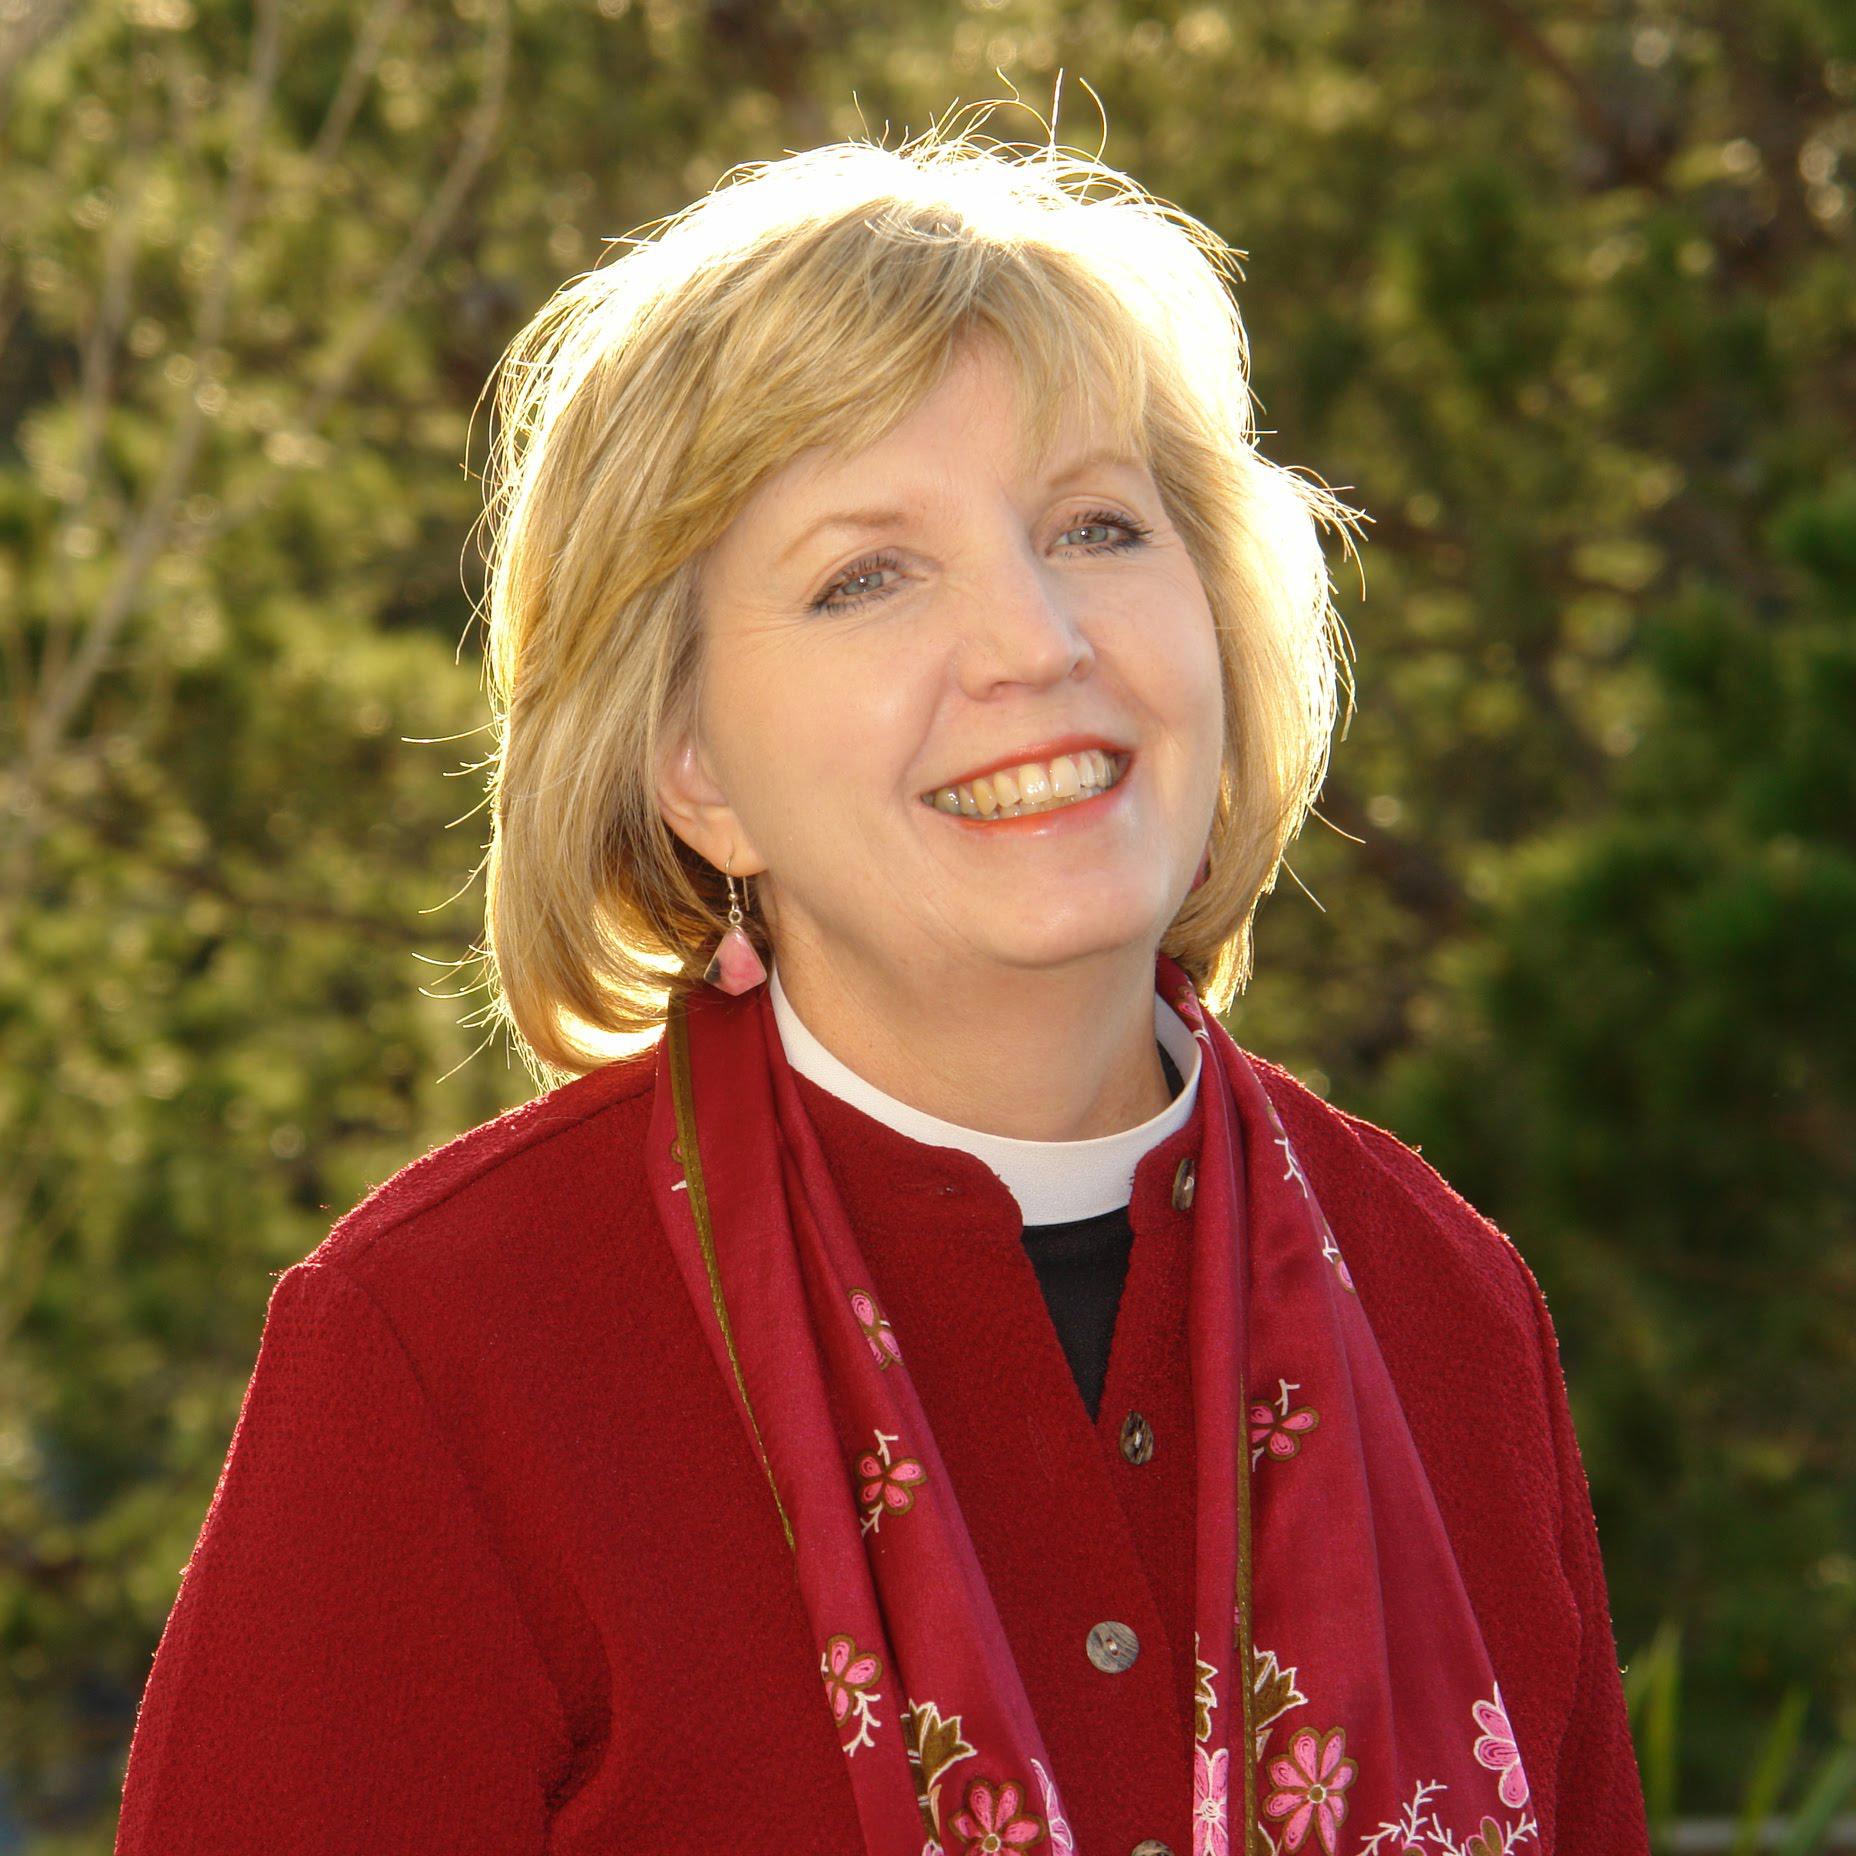 Rev. Melanie Donahoe, The Episcopal Church of the Epiphany